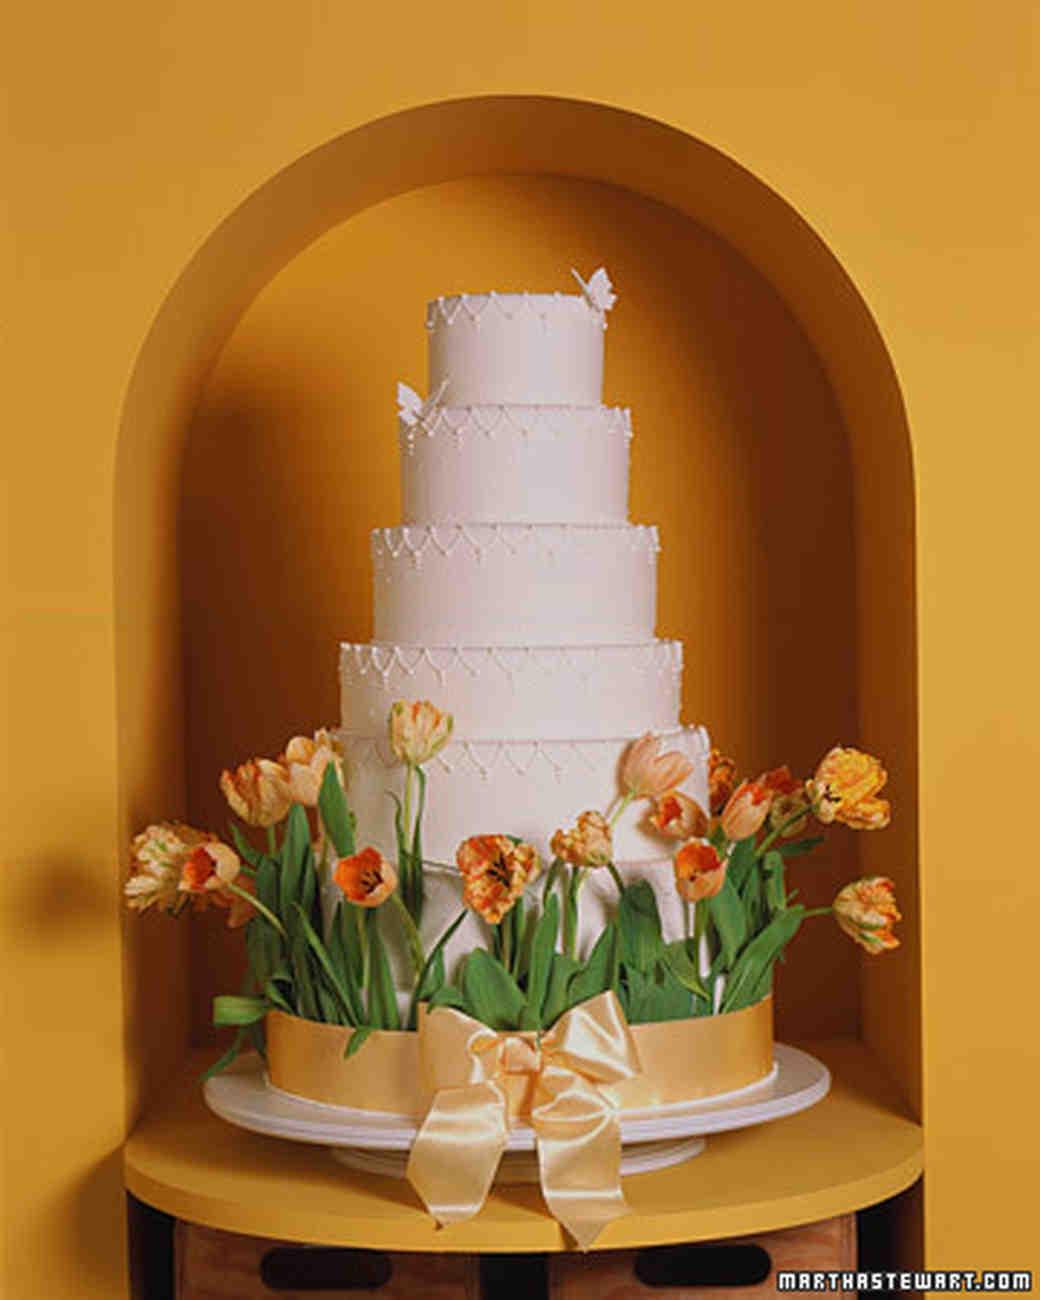 Royal Icing for Tulip Wedding Cake